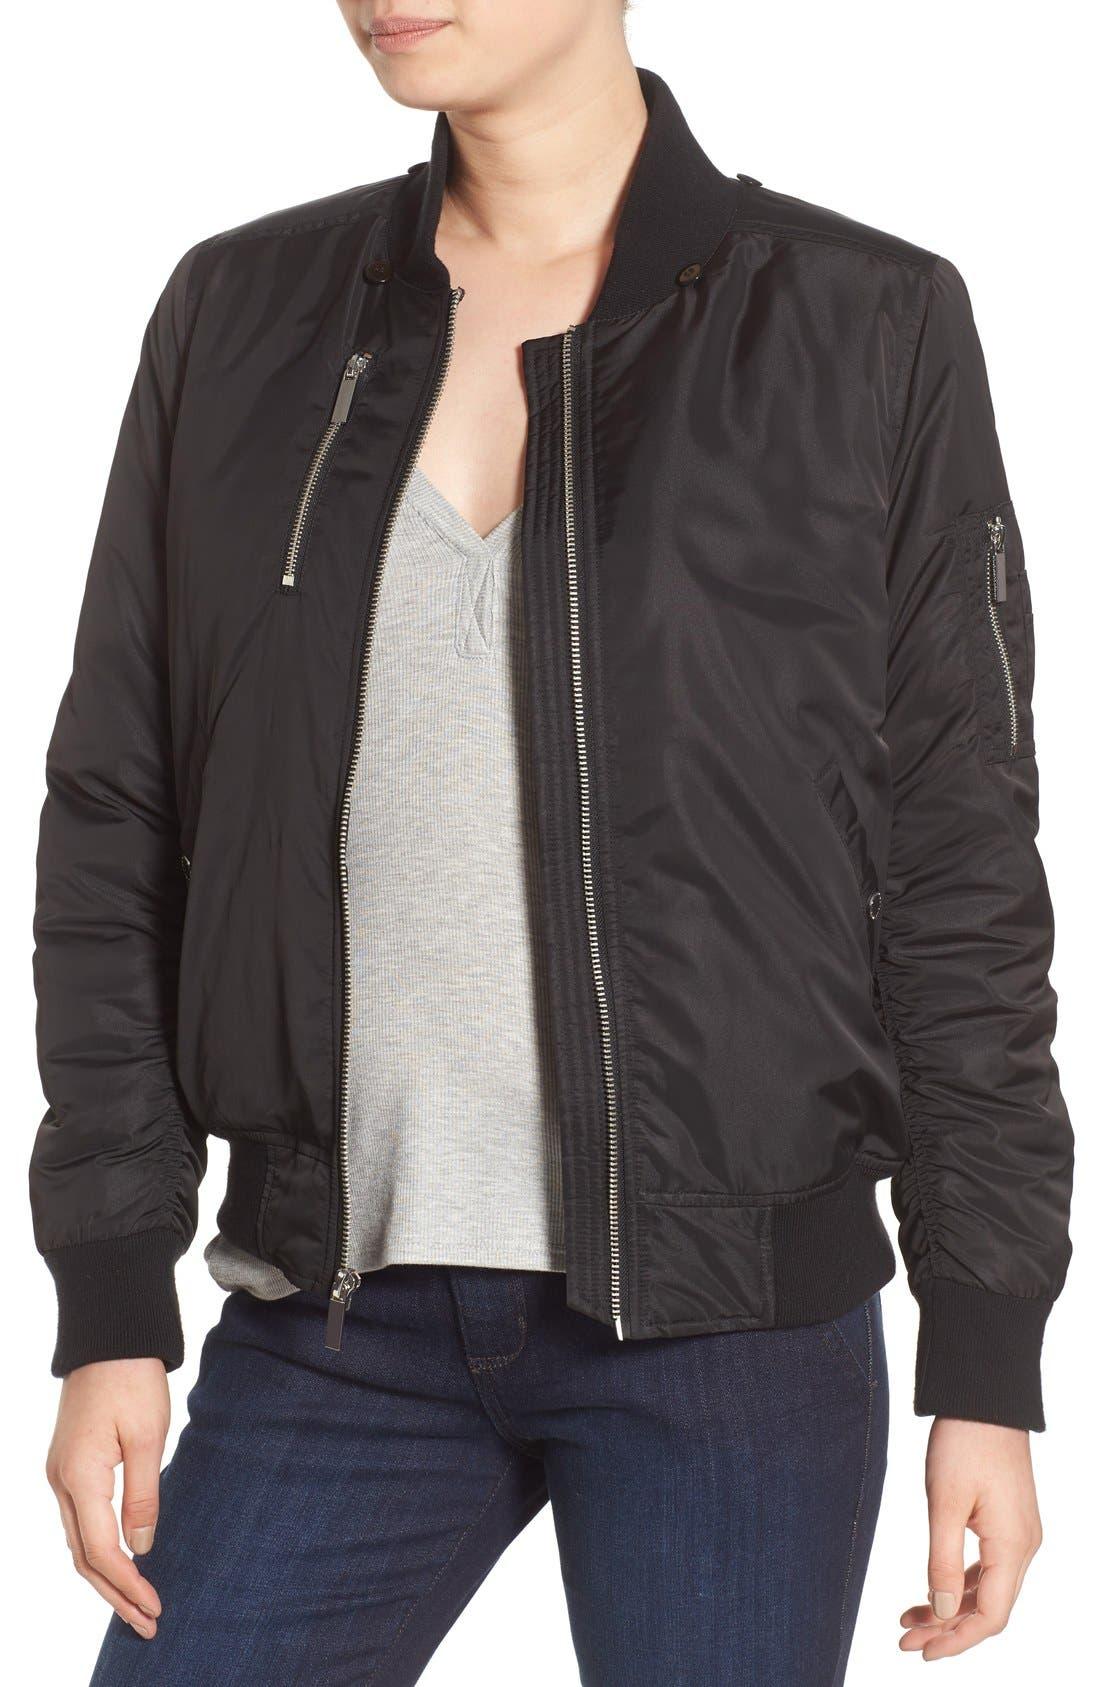 'Varsity' Hooded Bomber Jacket with Faux Fur Trim,                             Alternate thumbnail 4, color,                             Black